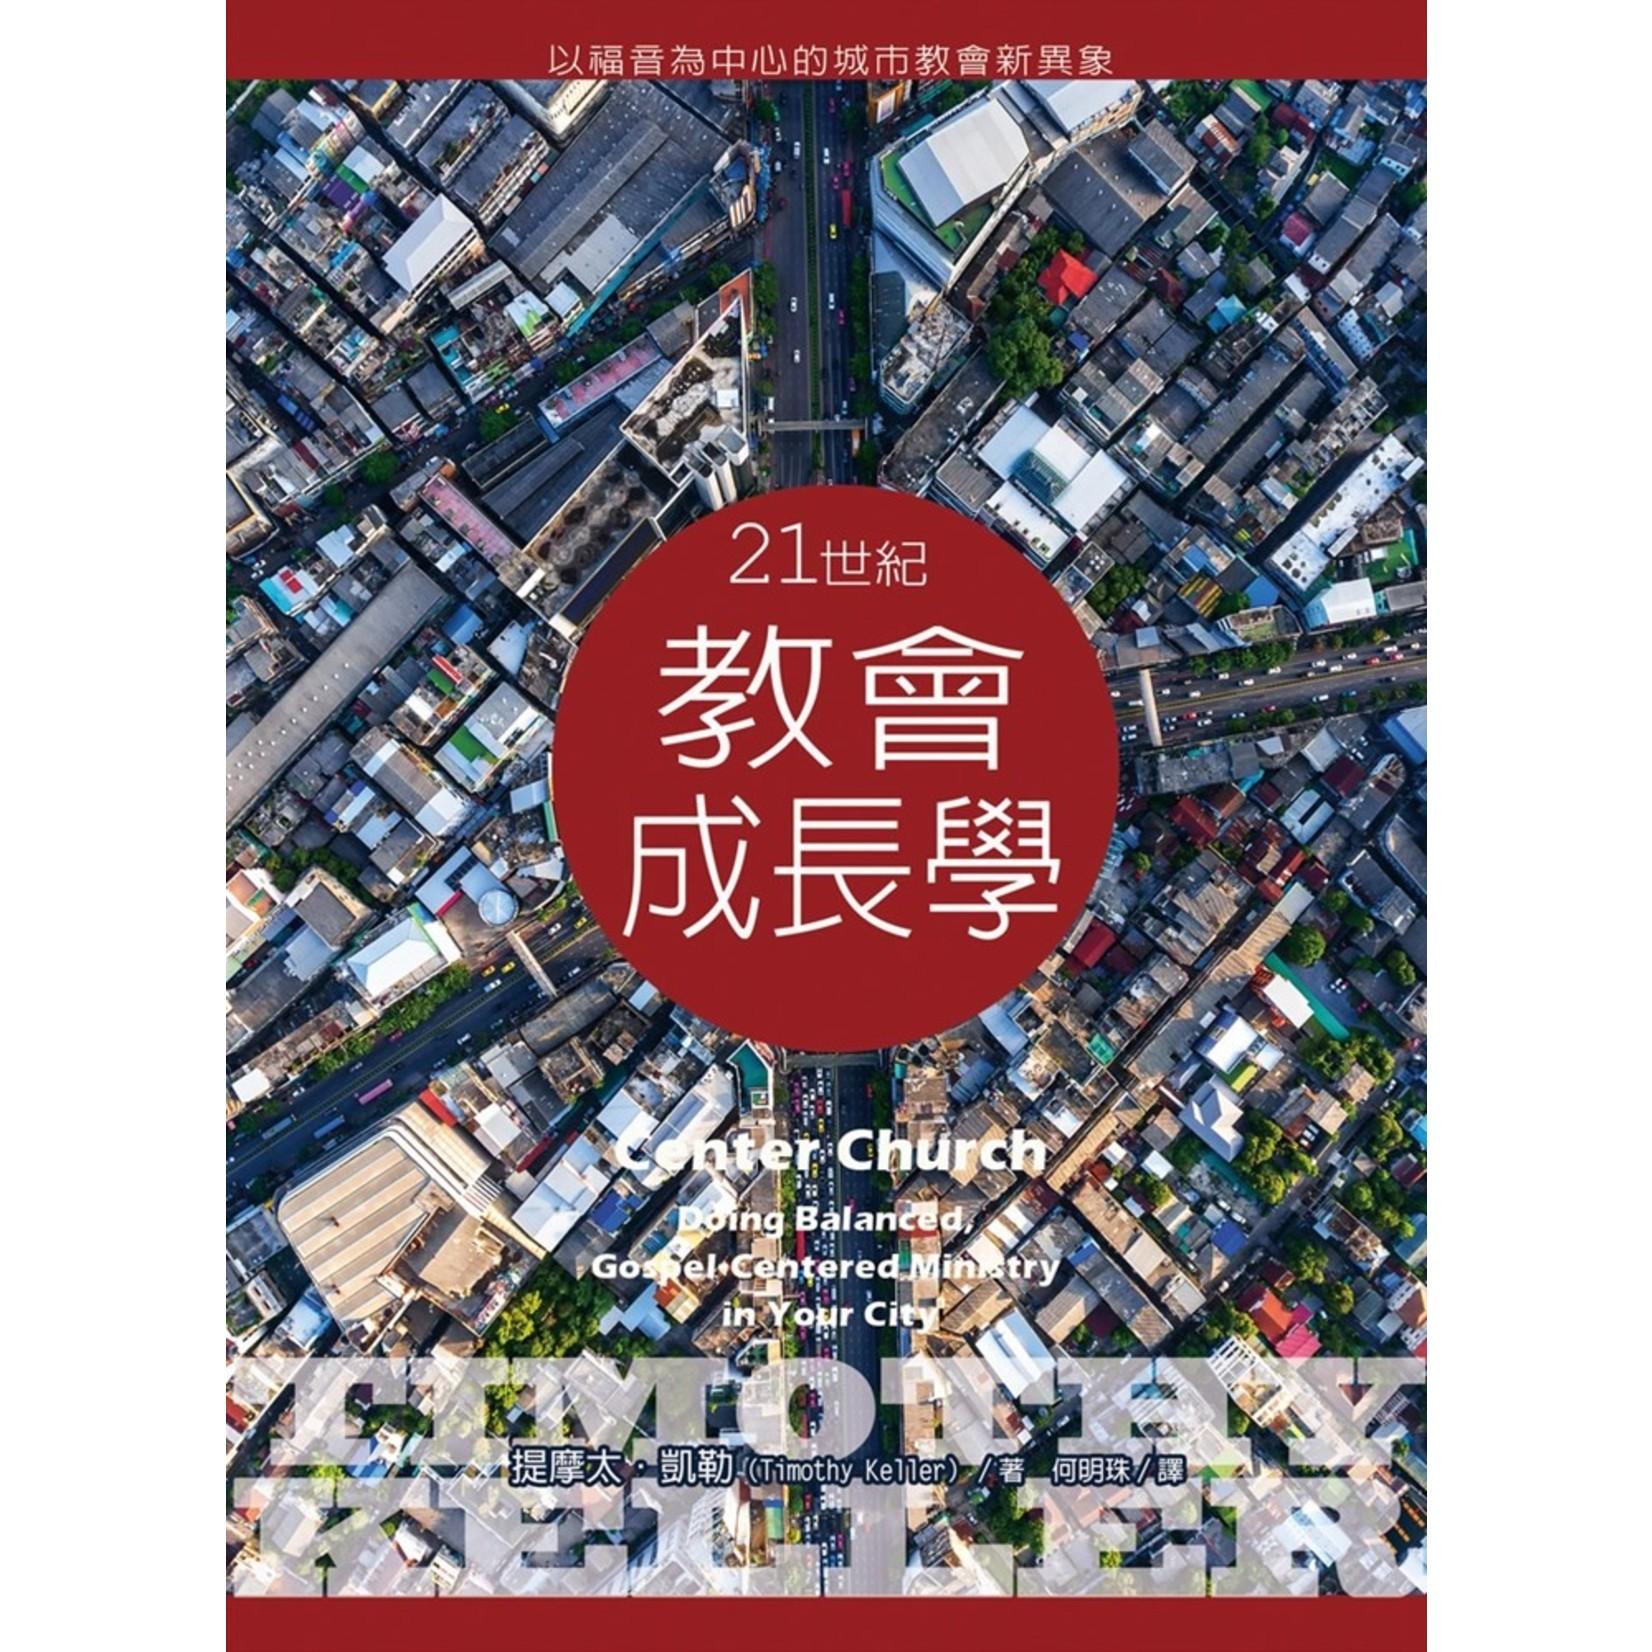 校園書房 Campus Books 21世紀教會成長學:以福音為中心的城市教會新異象 Center Church : Doing Balanced, Gospel-Centered Ministry in Your City